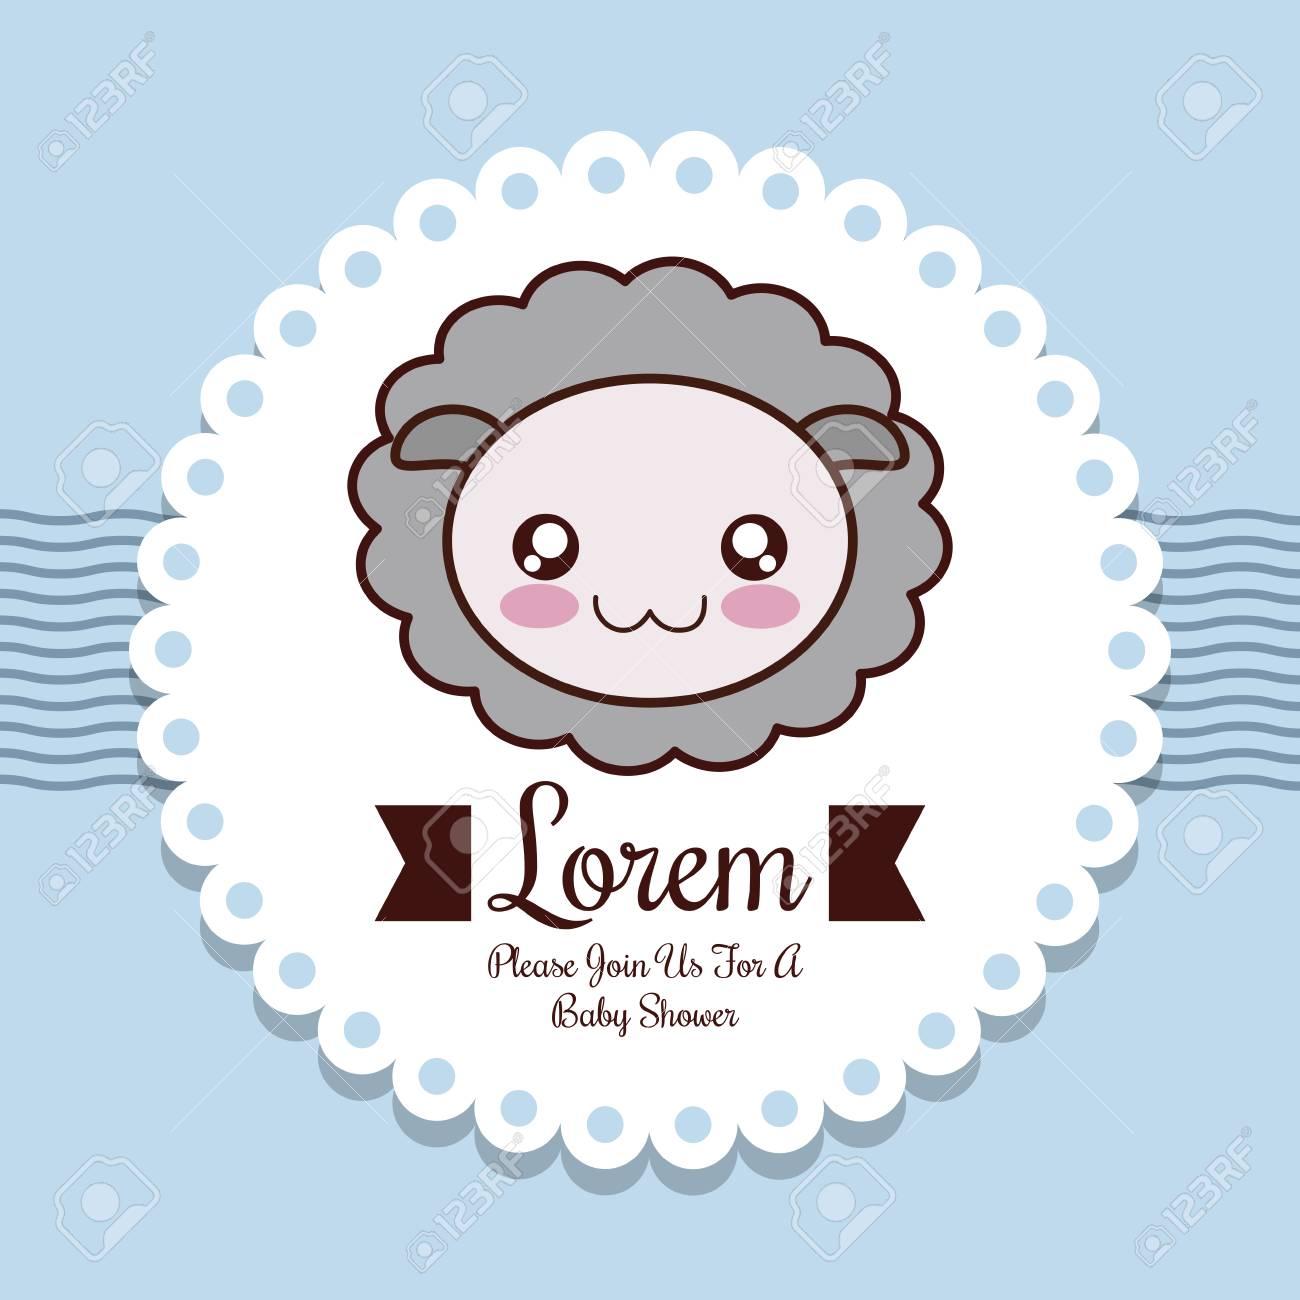 Baby Shower Invitation Design Represented By Sheep Cartoon ...